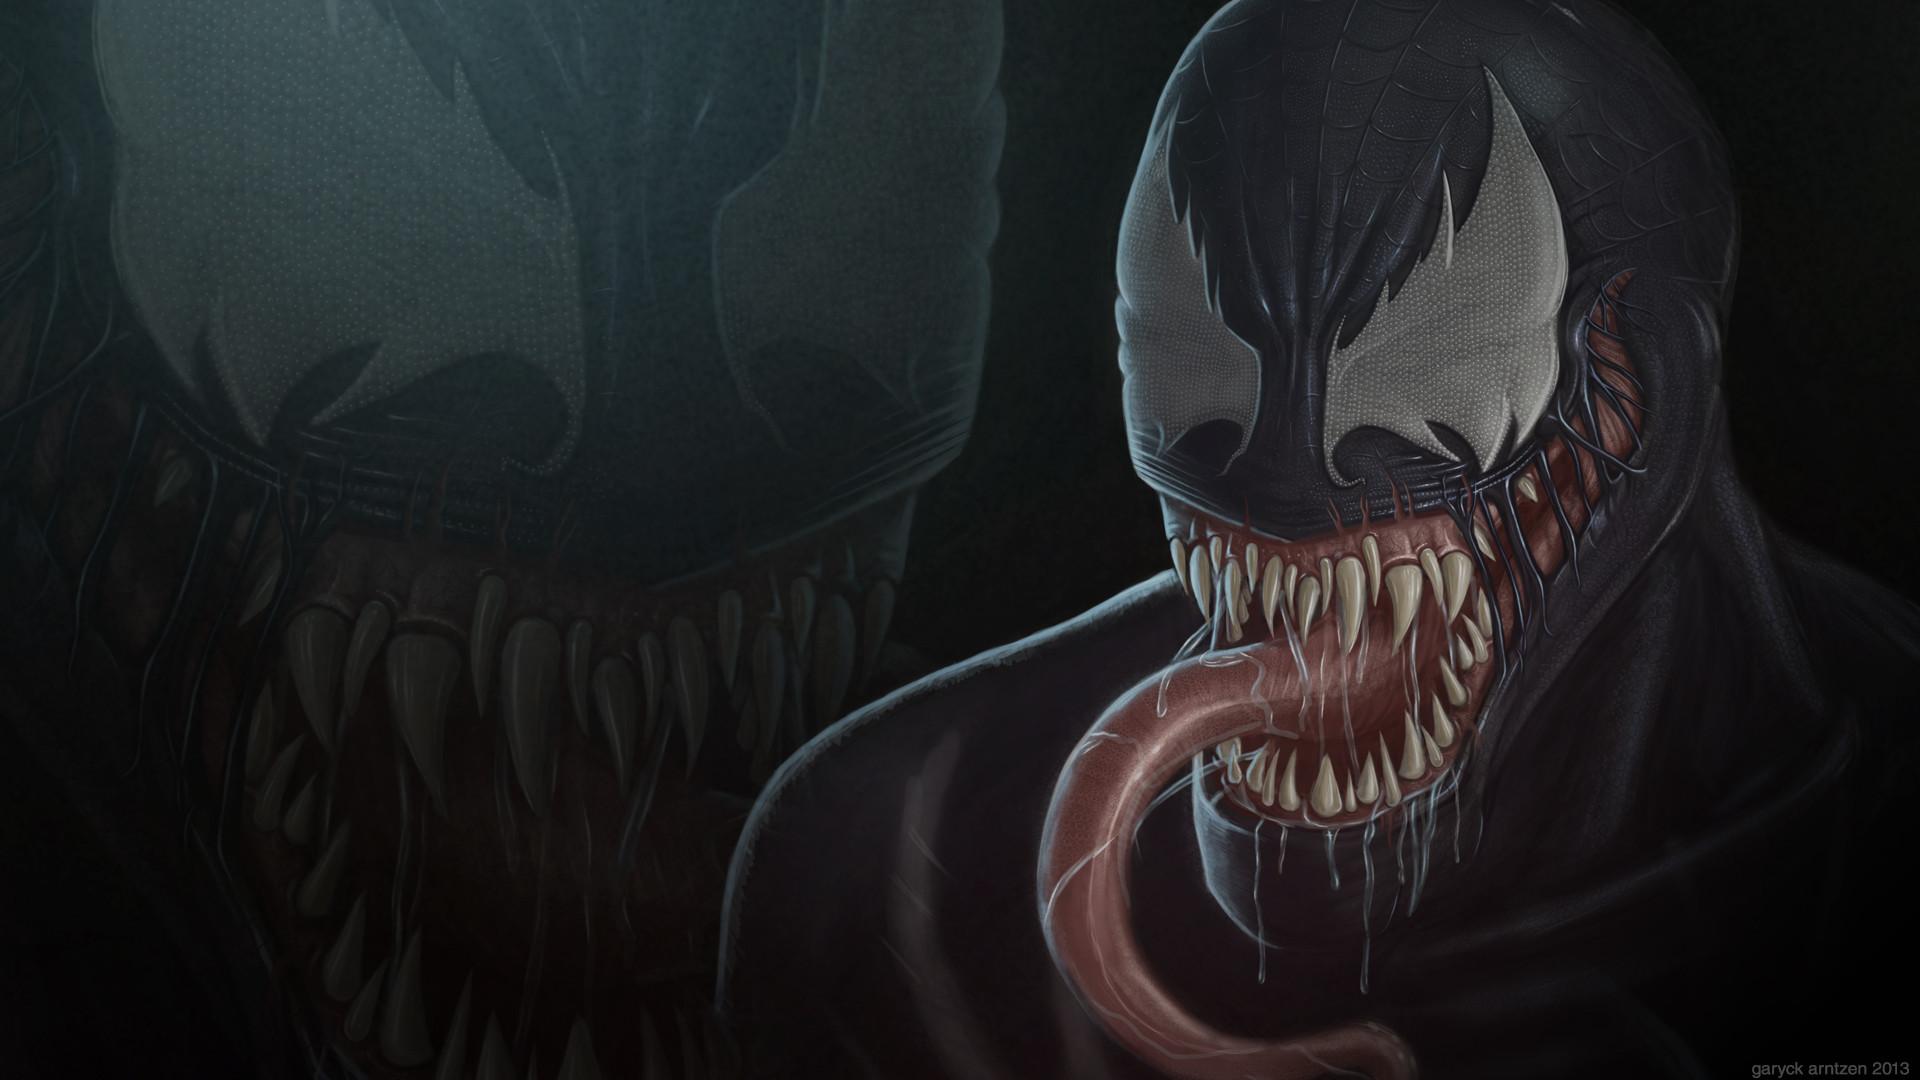 Related Pictures download venom wallpaper ultimate spiderman venom 1920x1080